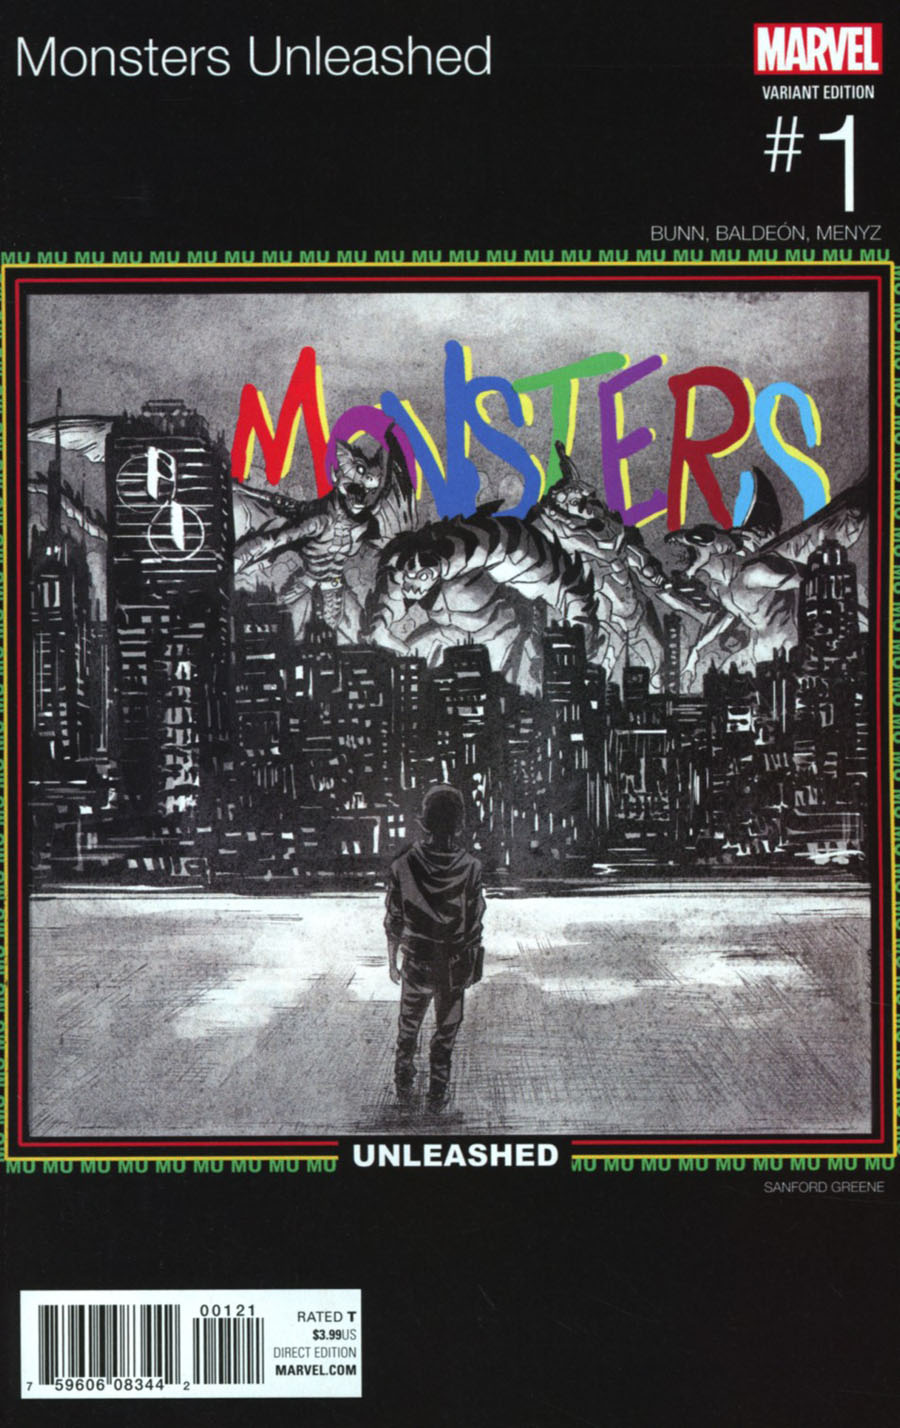 Monsters Unleashed Vol 2 #1 Cover B Variant Sanford Greene Marvel Hip-Hop Cover